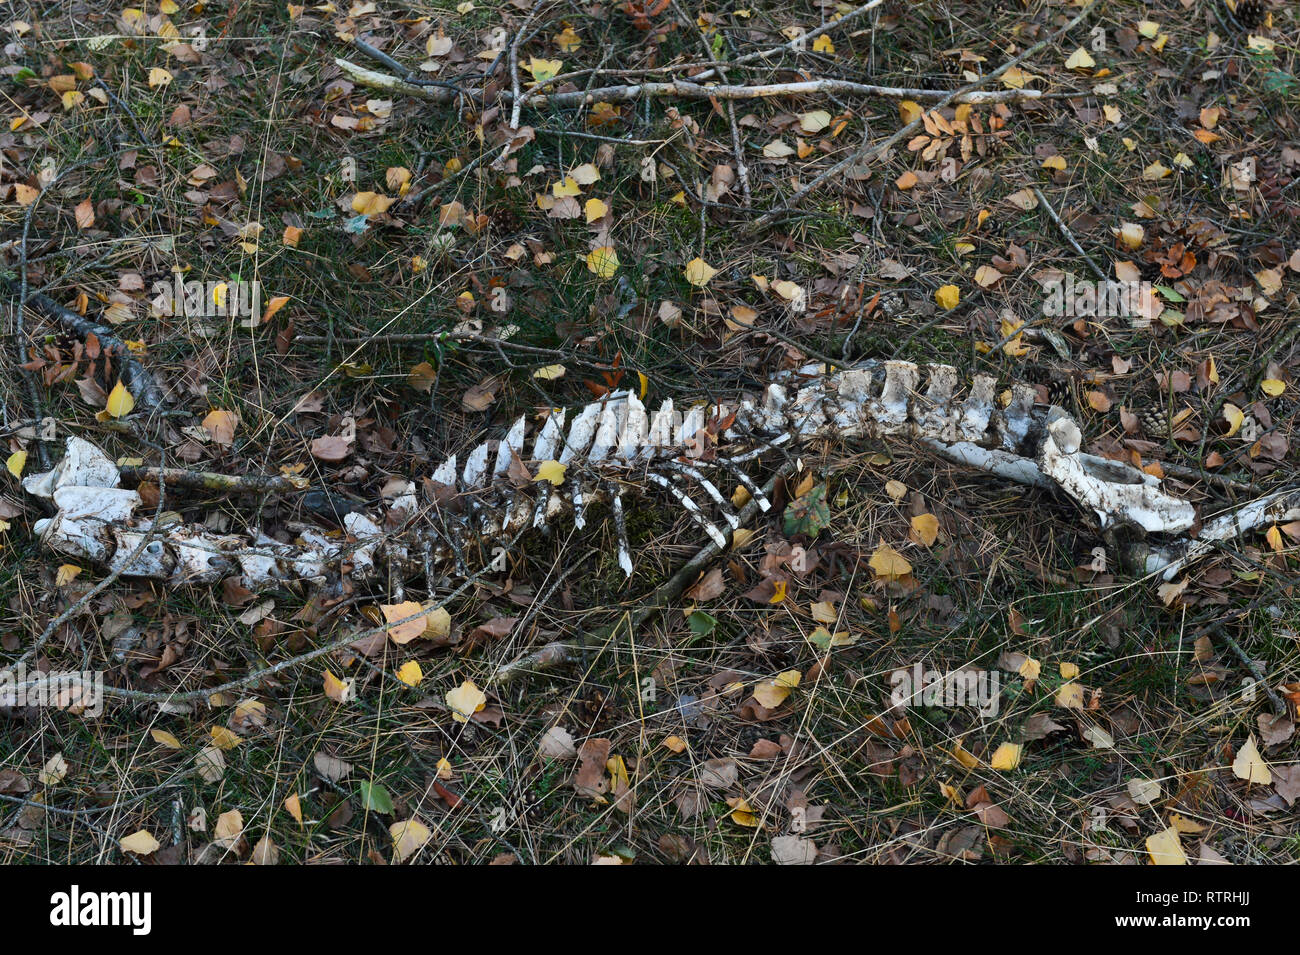 Dead Animal Backbone - Stock Image